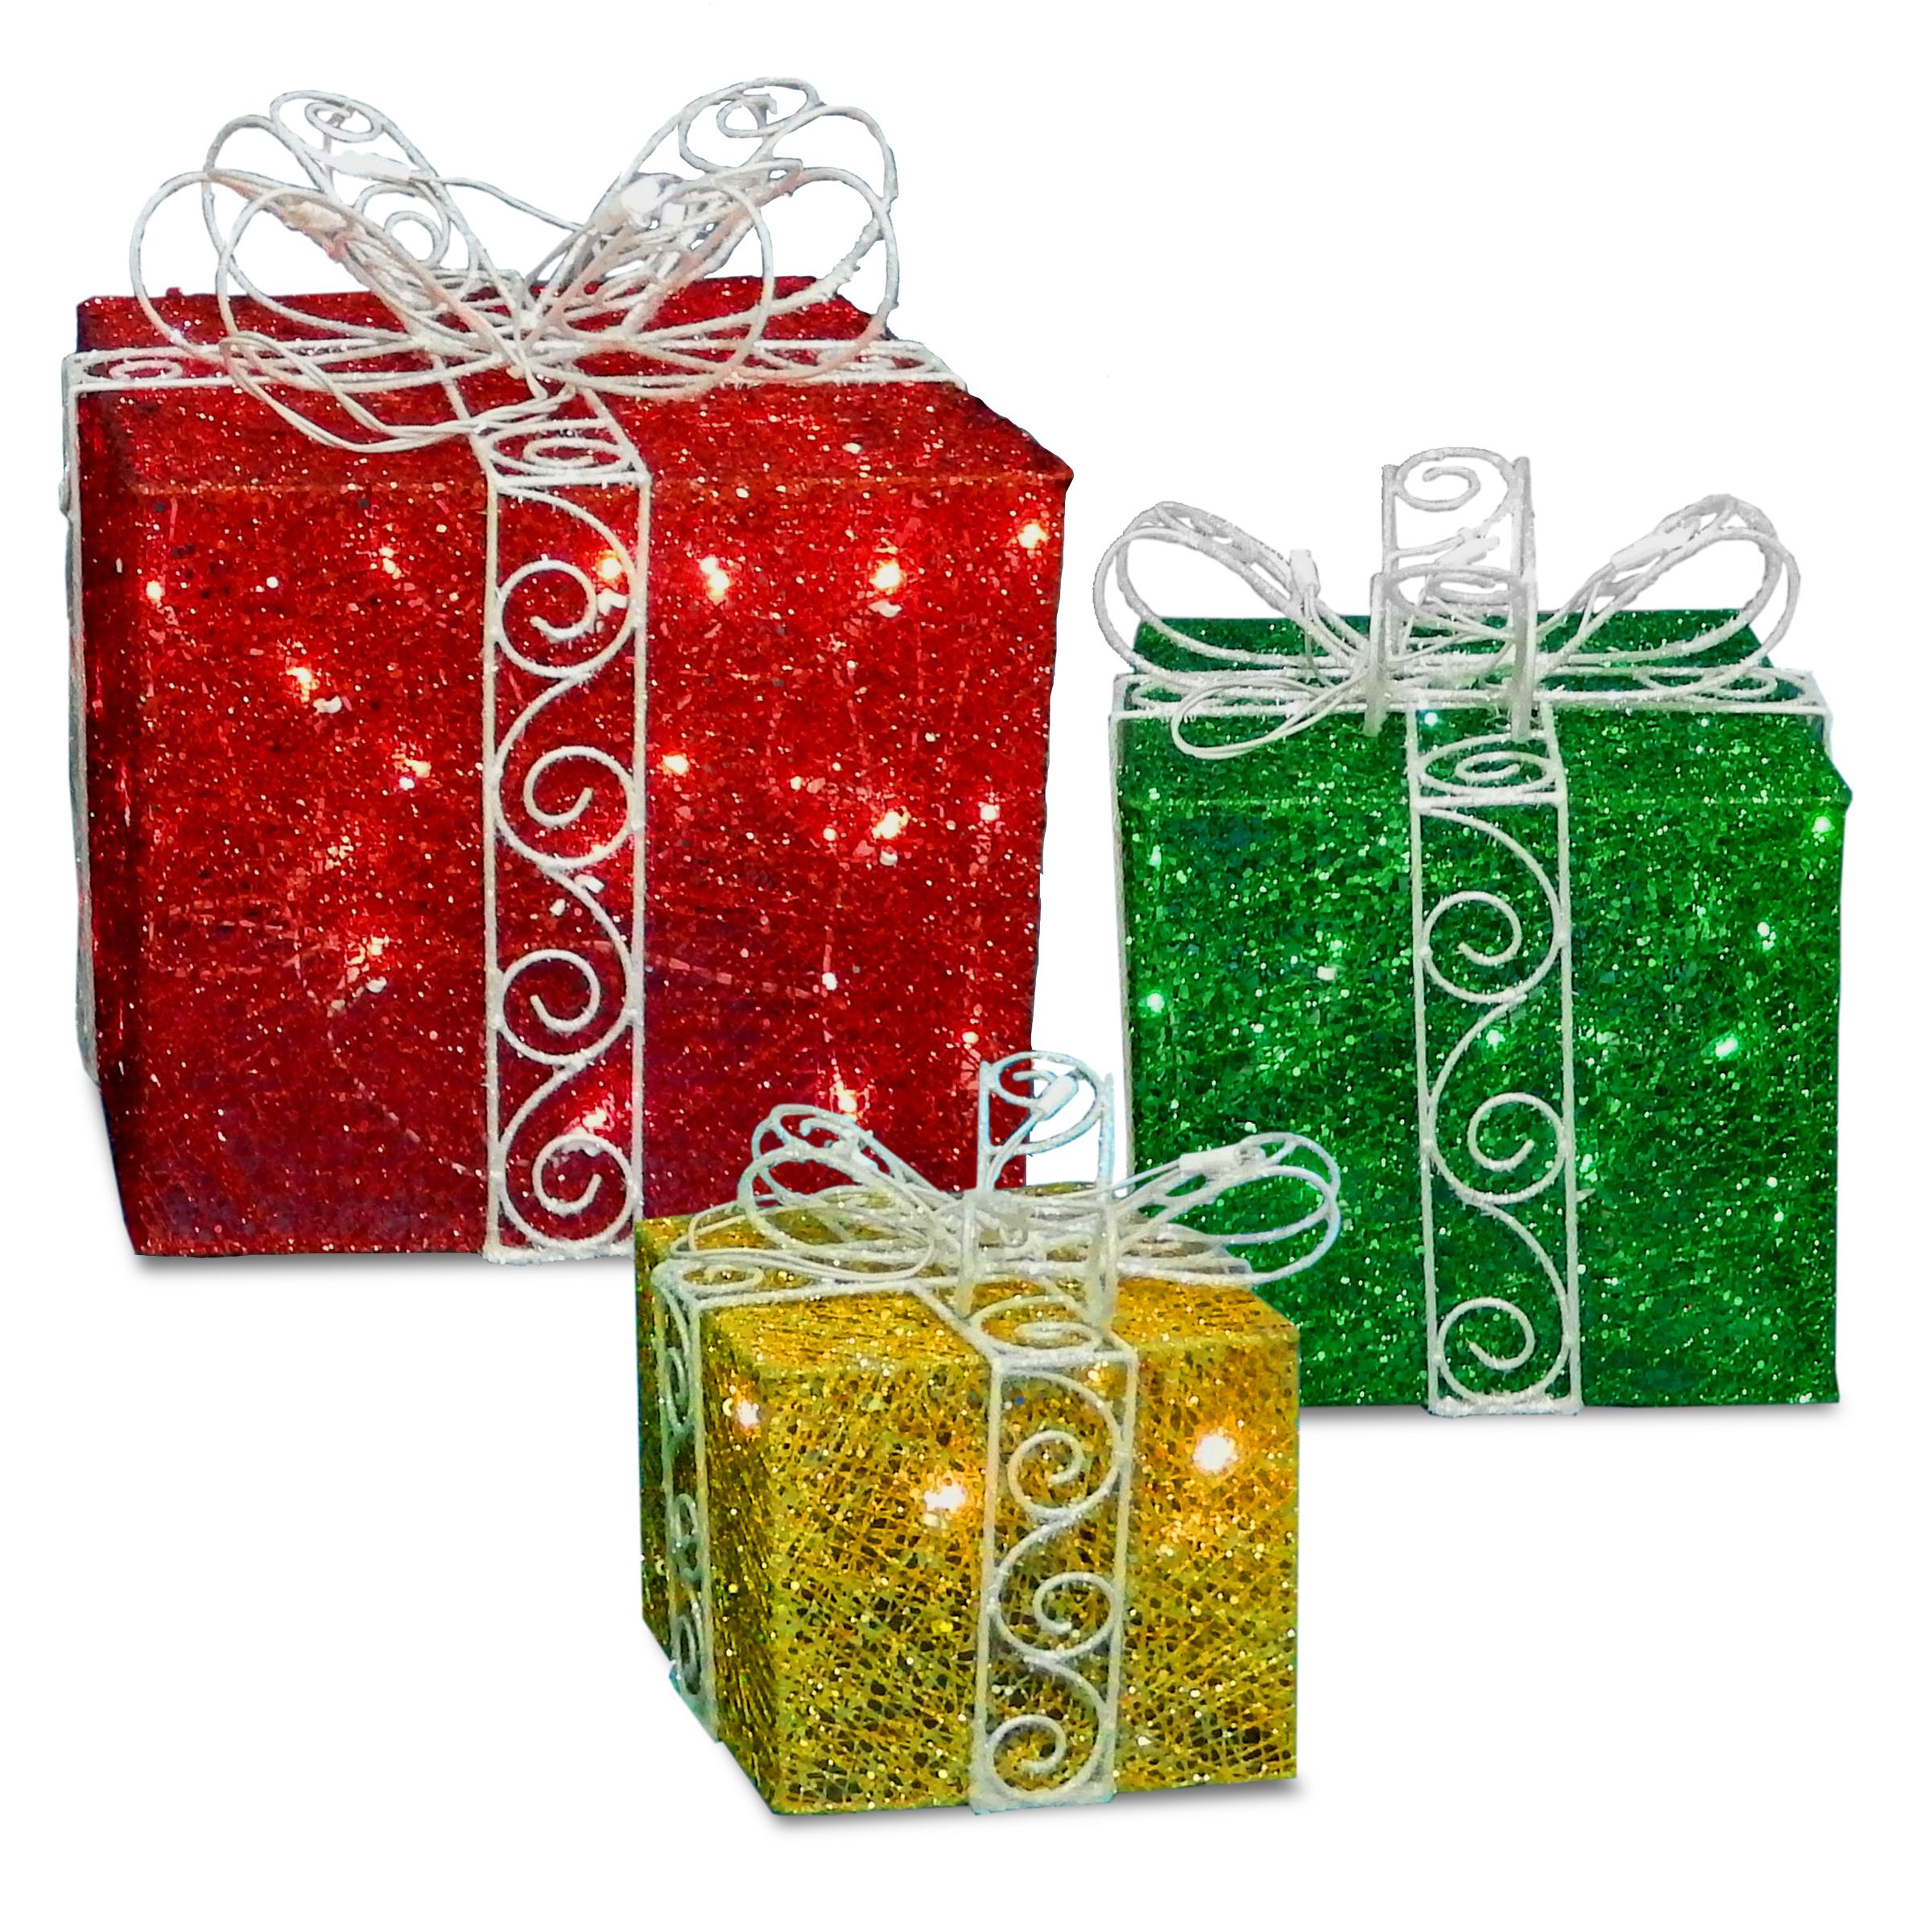 National Tree Pre Lit Sisal Gift Box Assortment Set Of 3 Size 9 12 15 Walmart Com Walmart Com